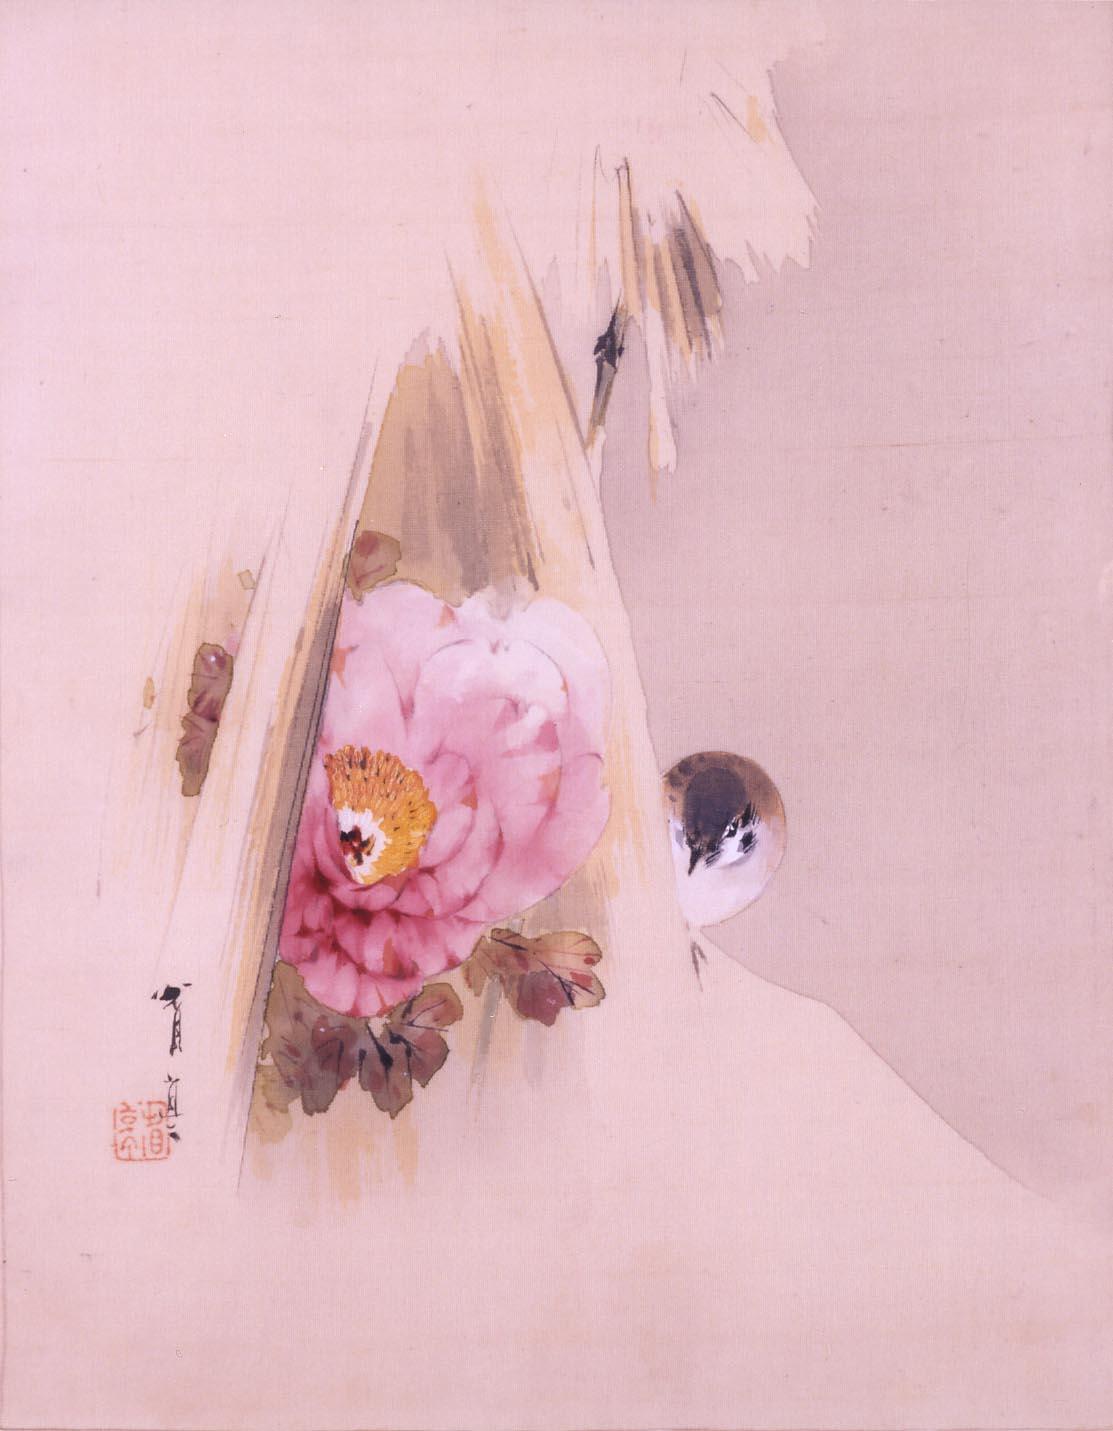 渡辺省亭の画像 p1_37